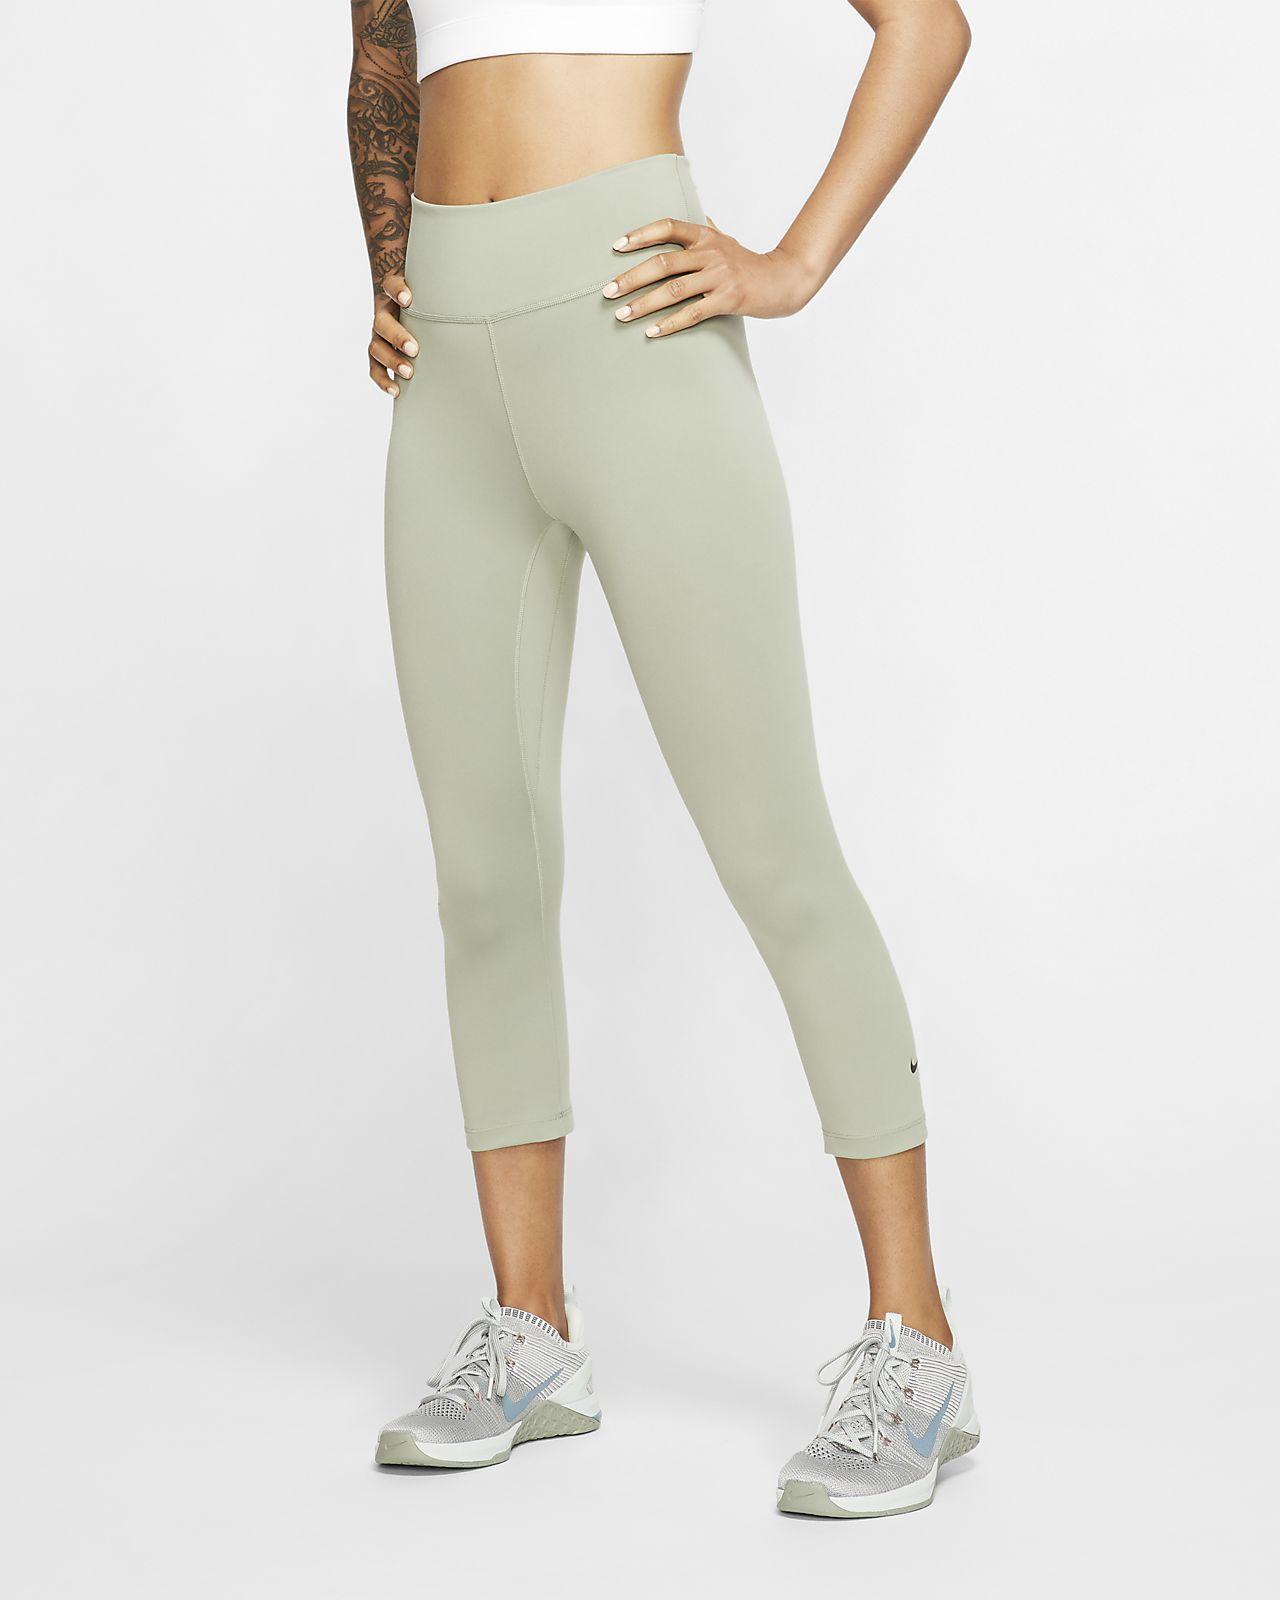 Capri Nike One - Donna